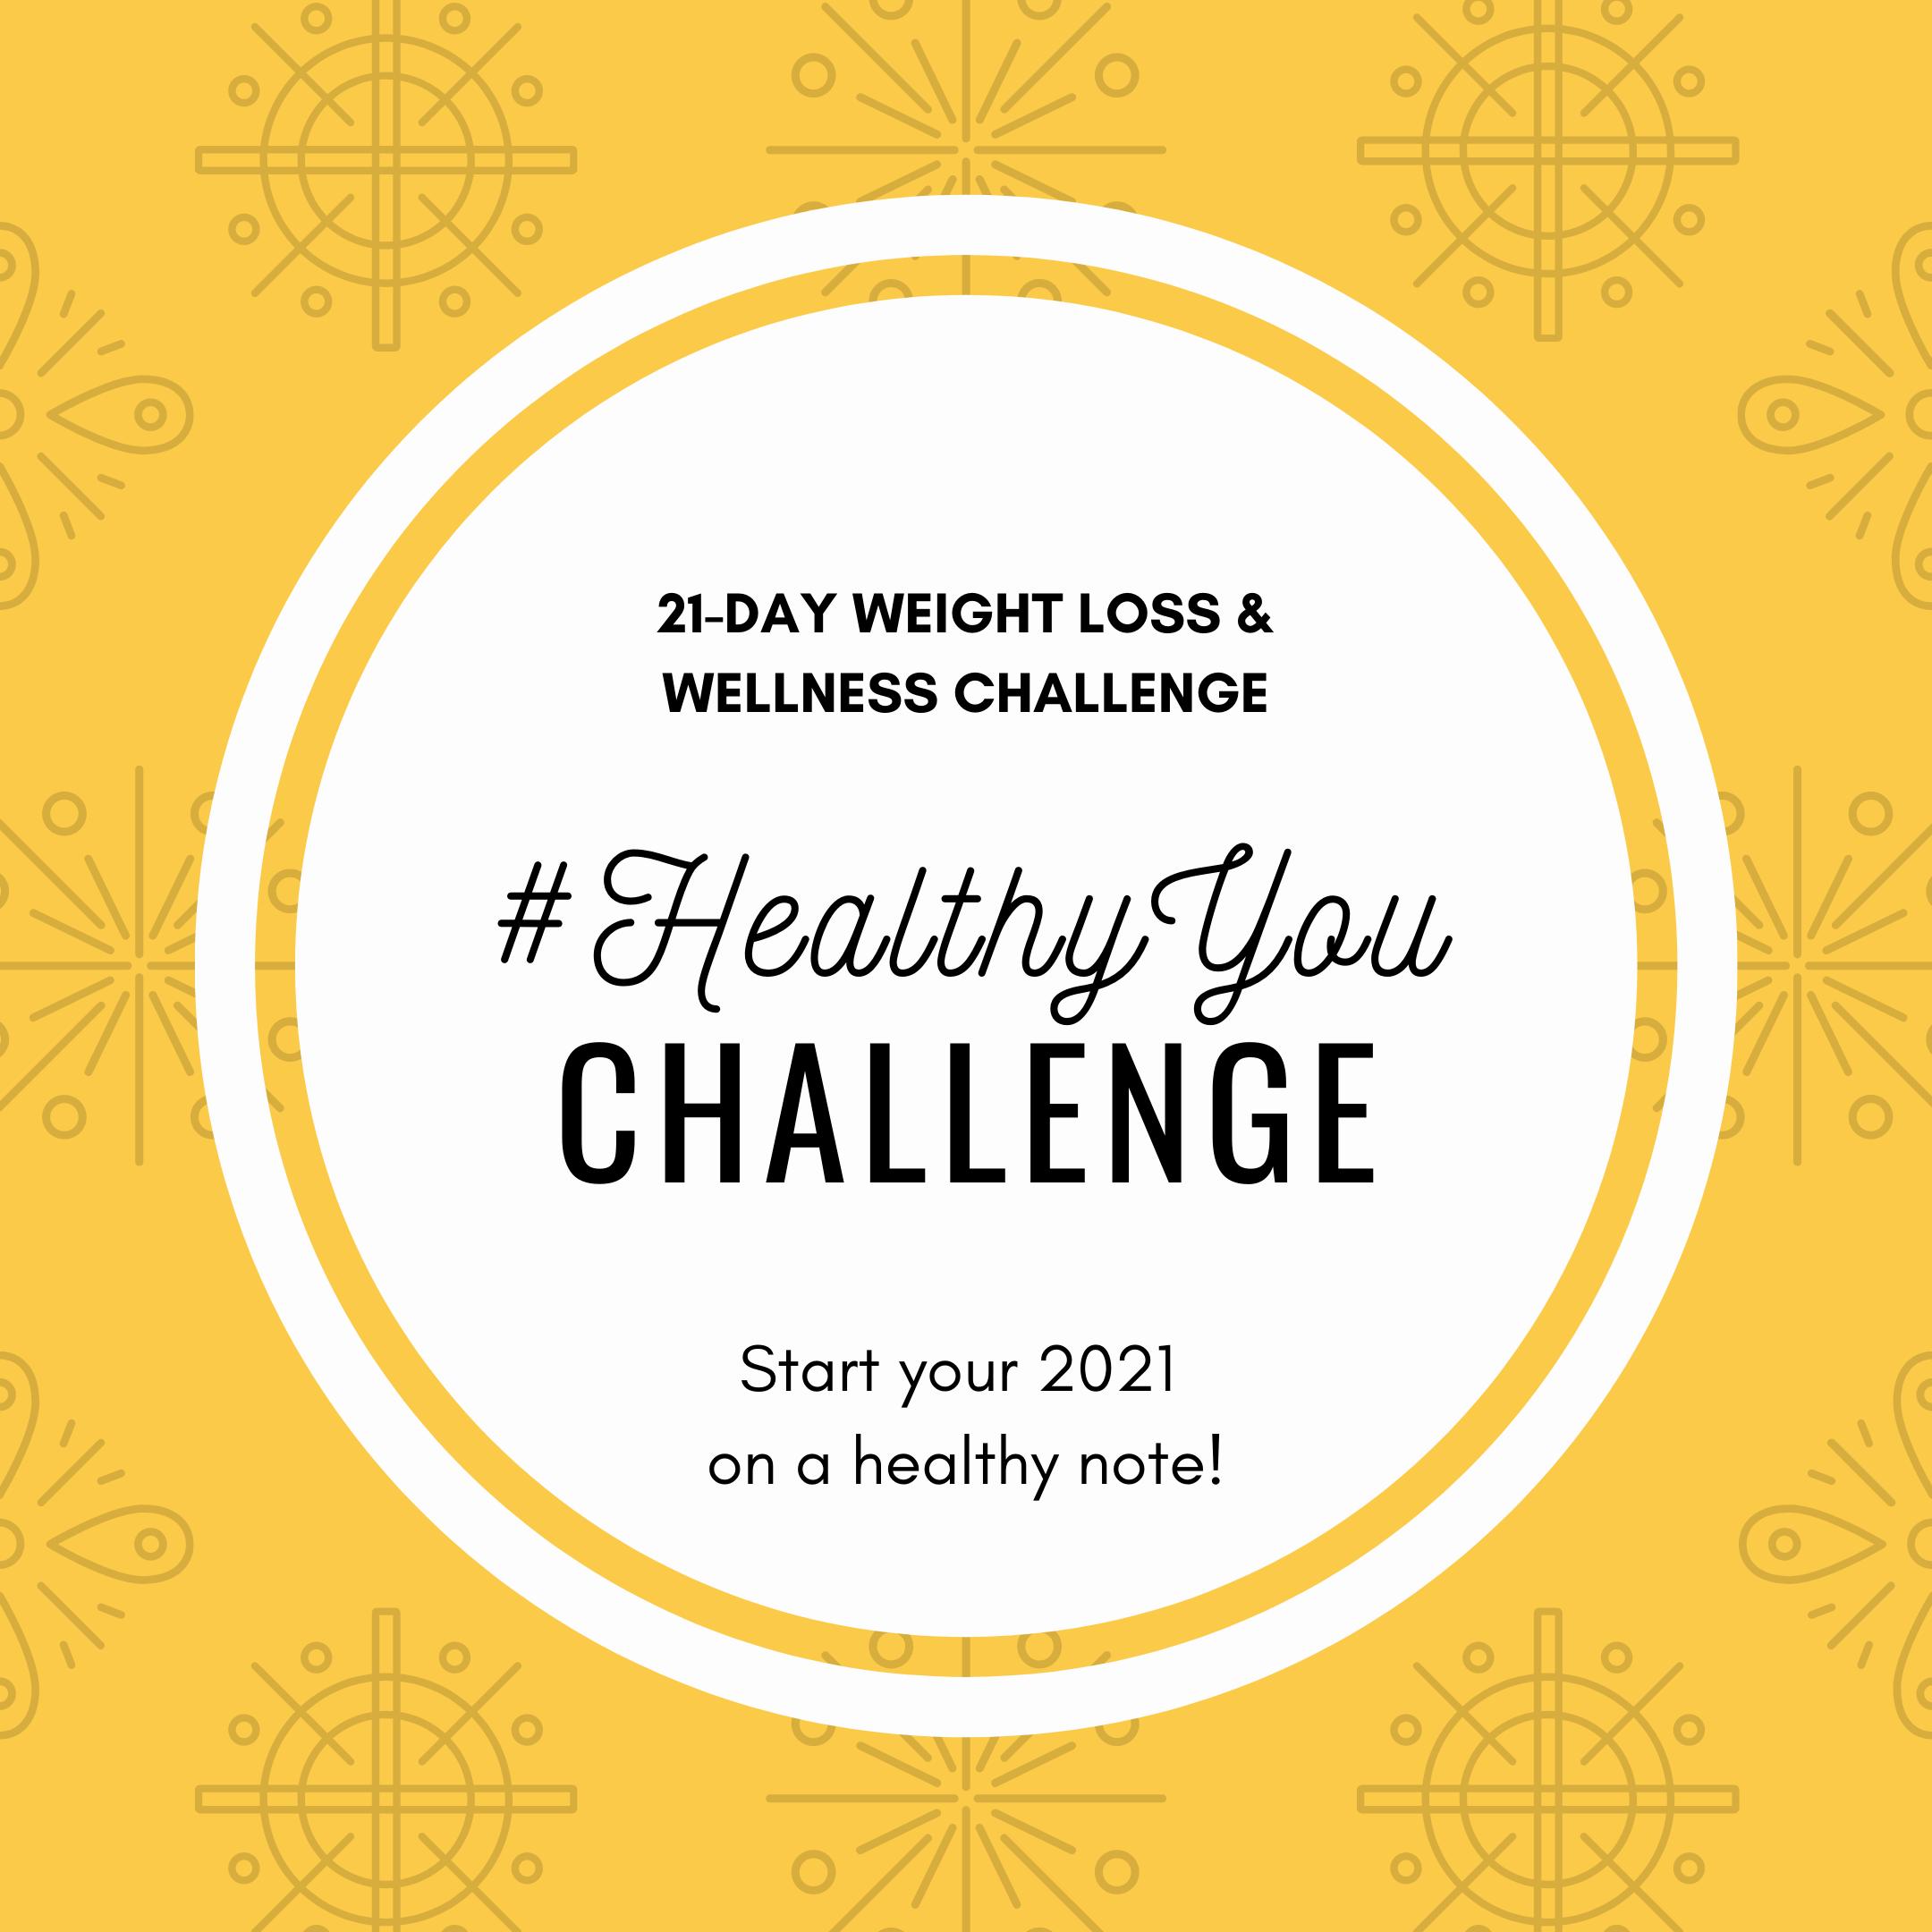 21-day Weight Loss & Wellness Challenge - #HealthyYou Challenge